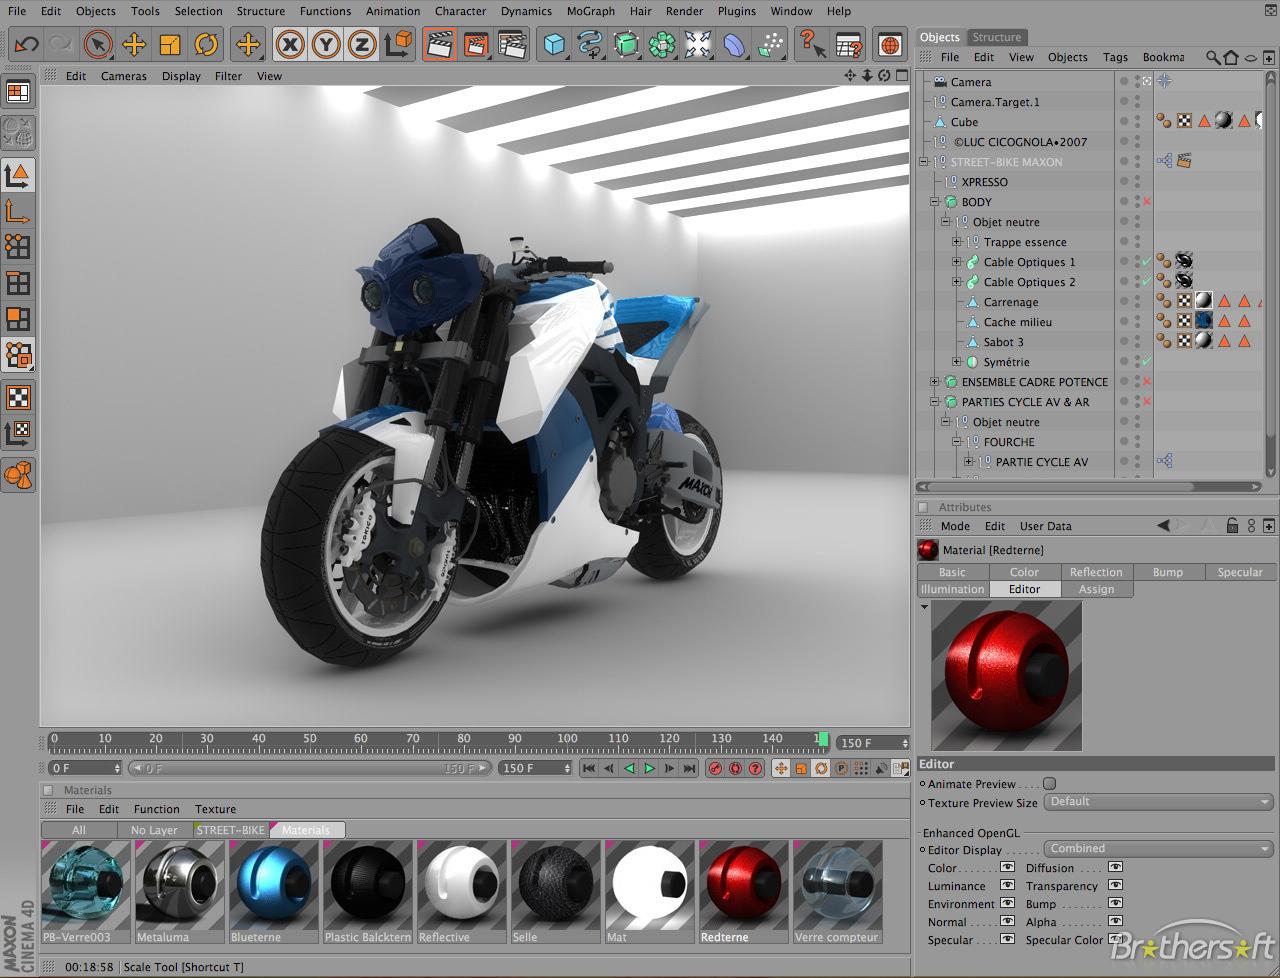 3D Graphic Design Software | Joy Studio Design Gallery Photo - photo#19